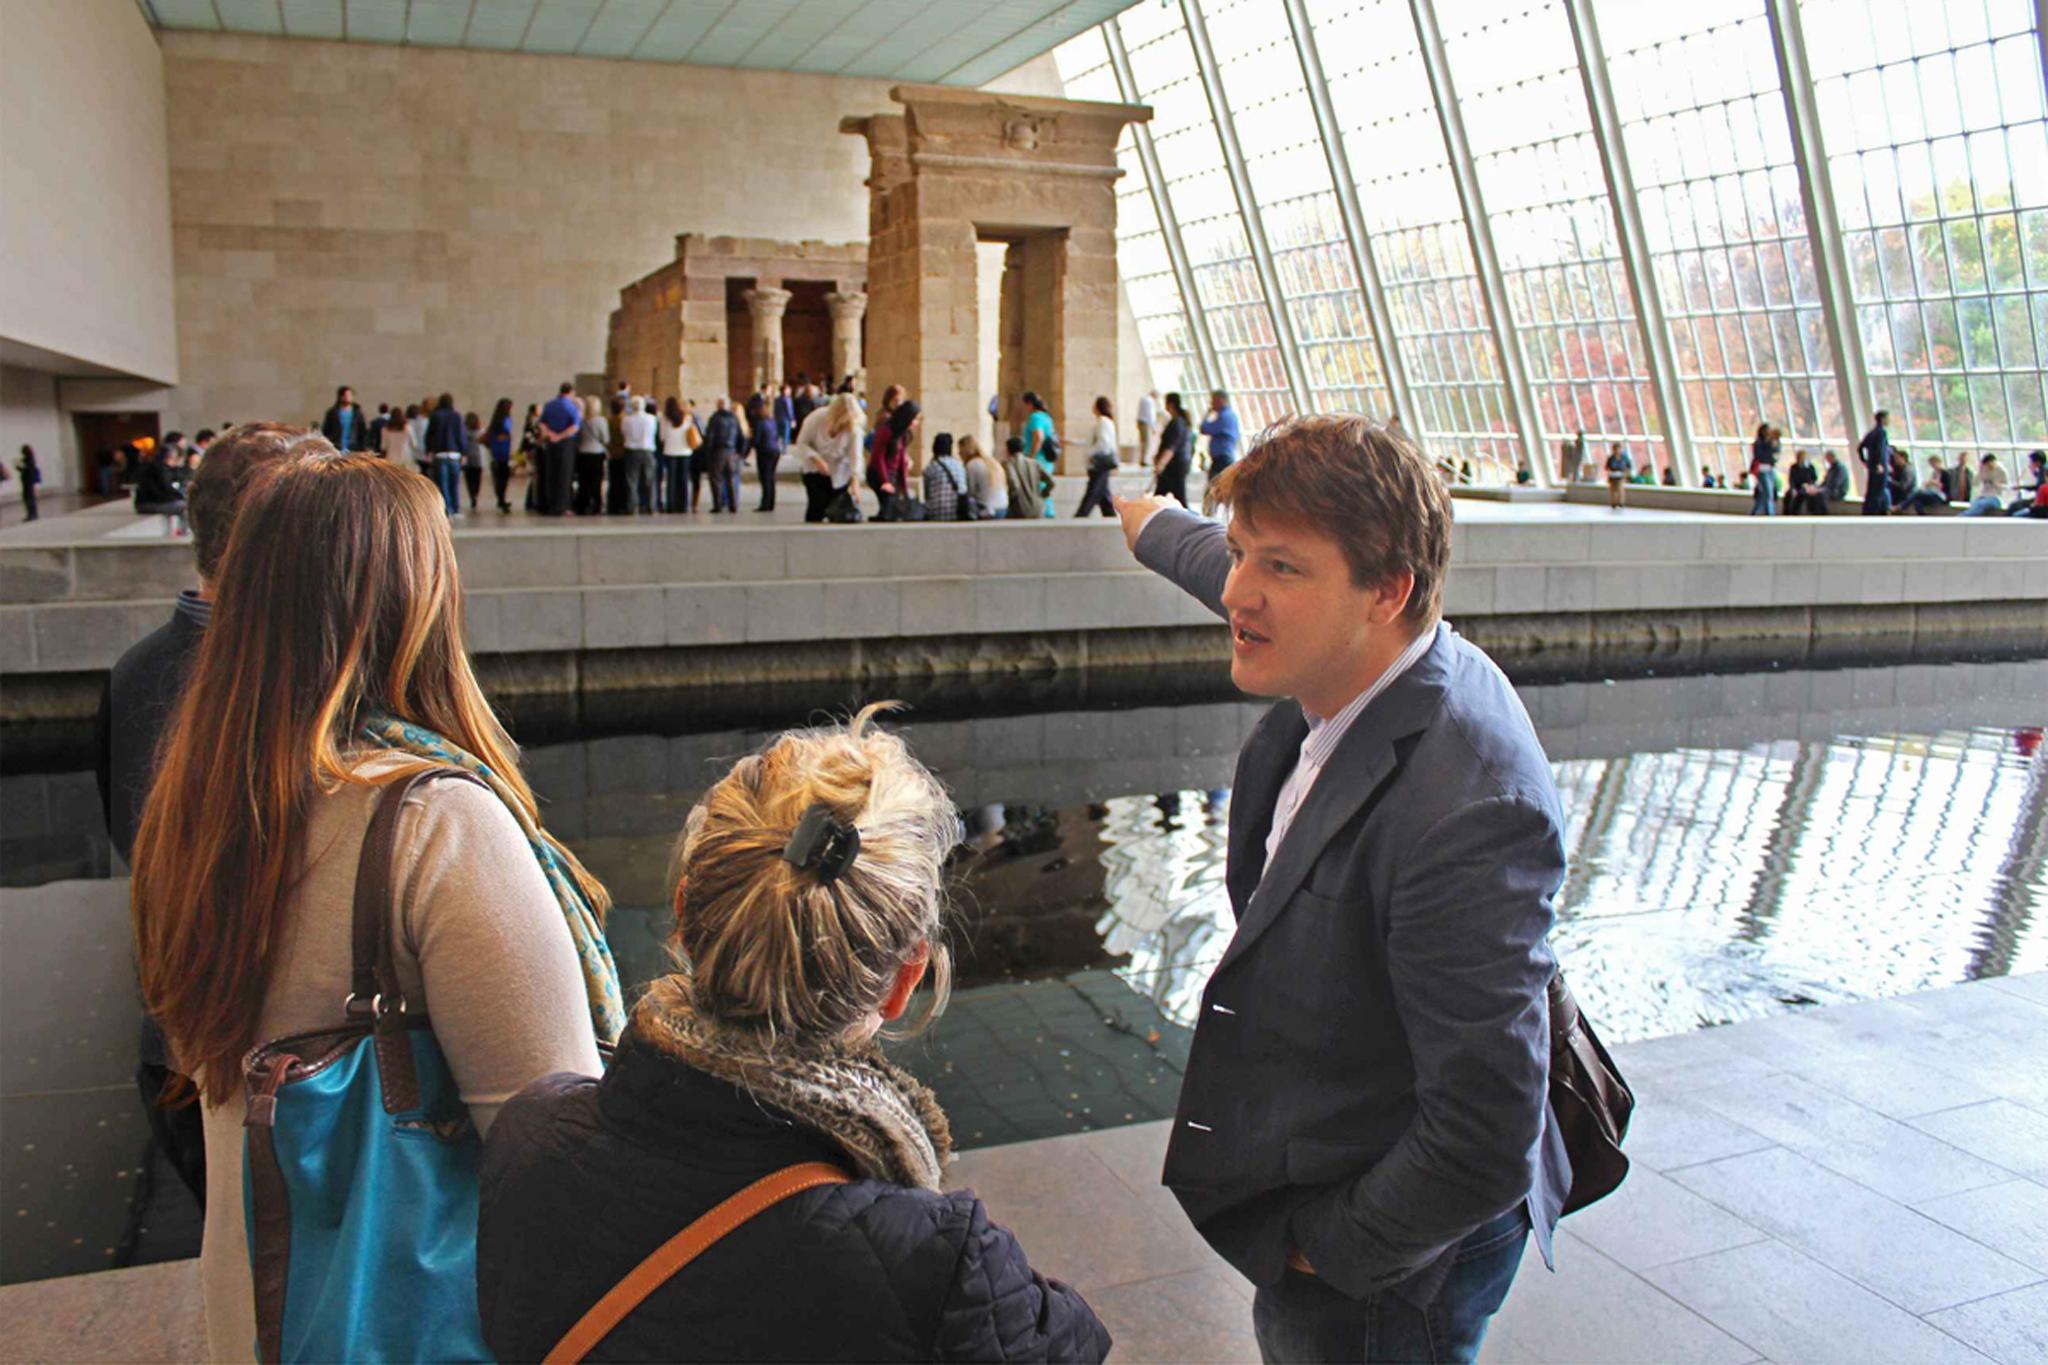 Explore galleries at The Met